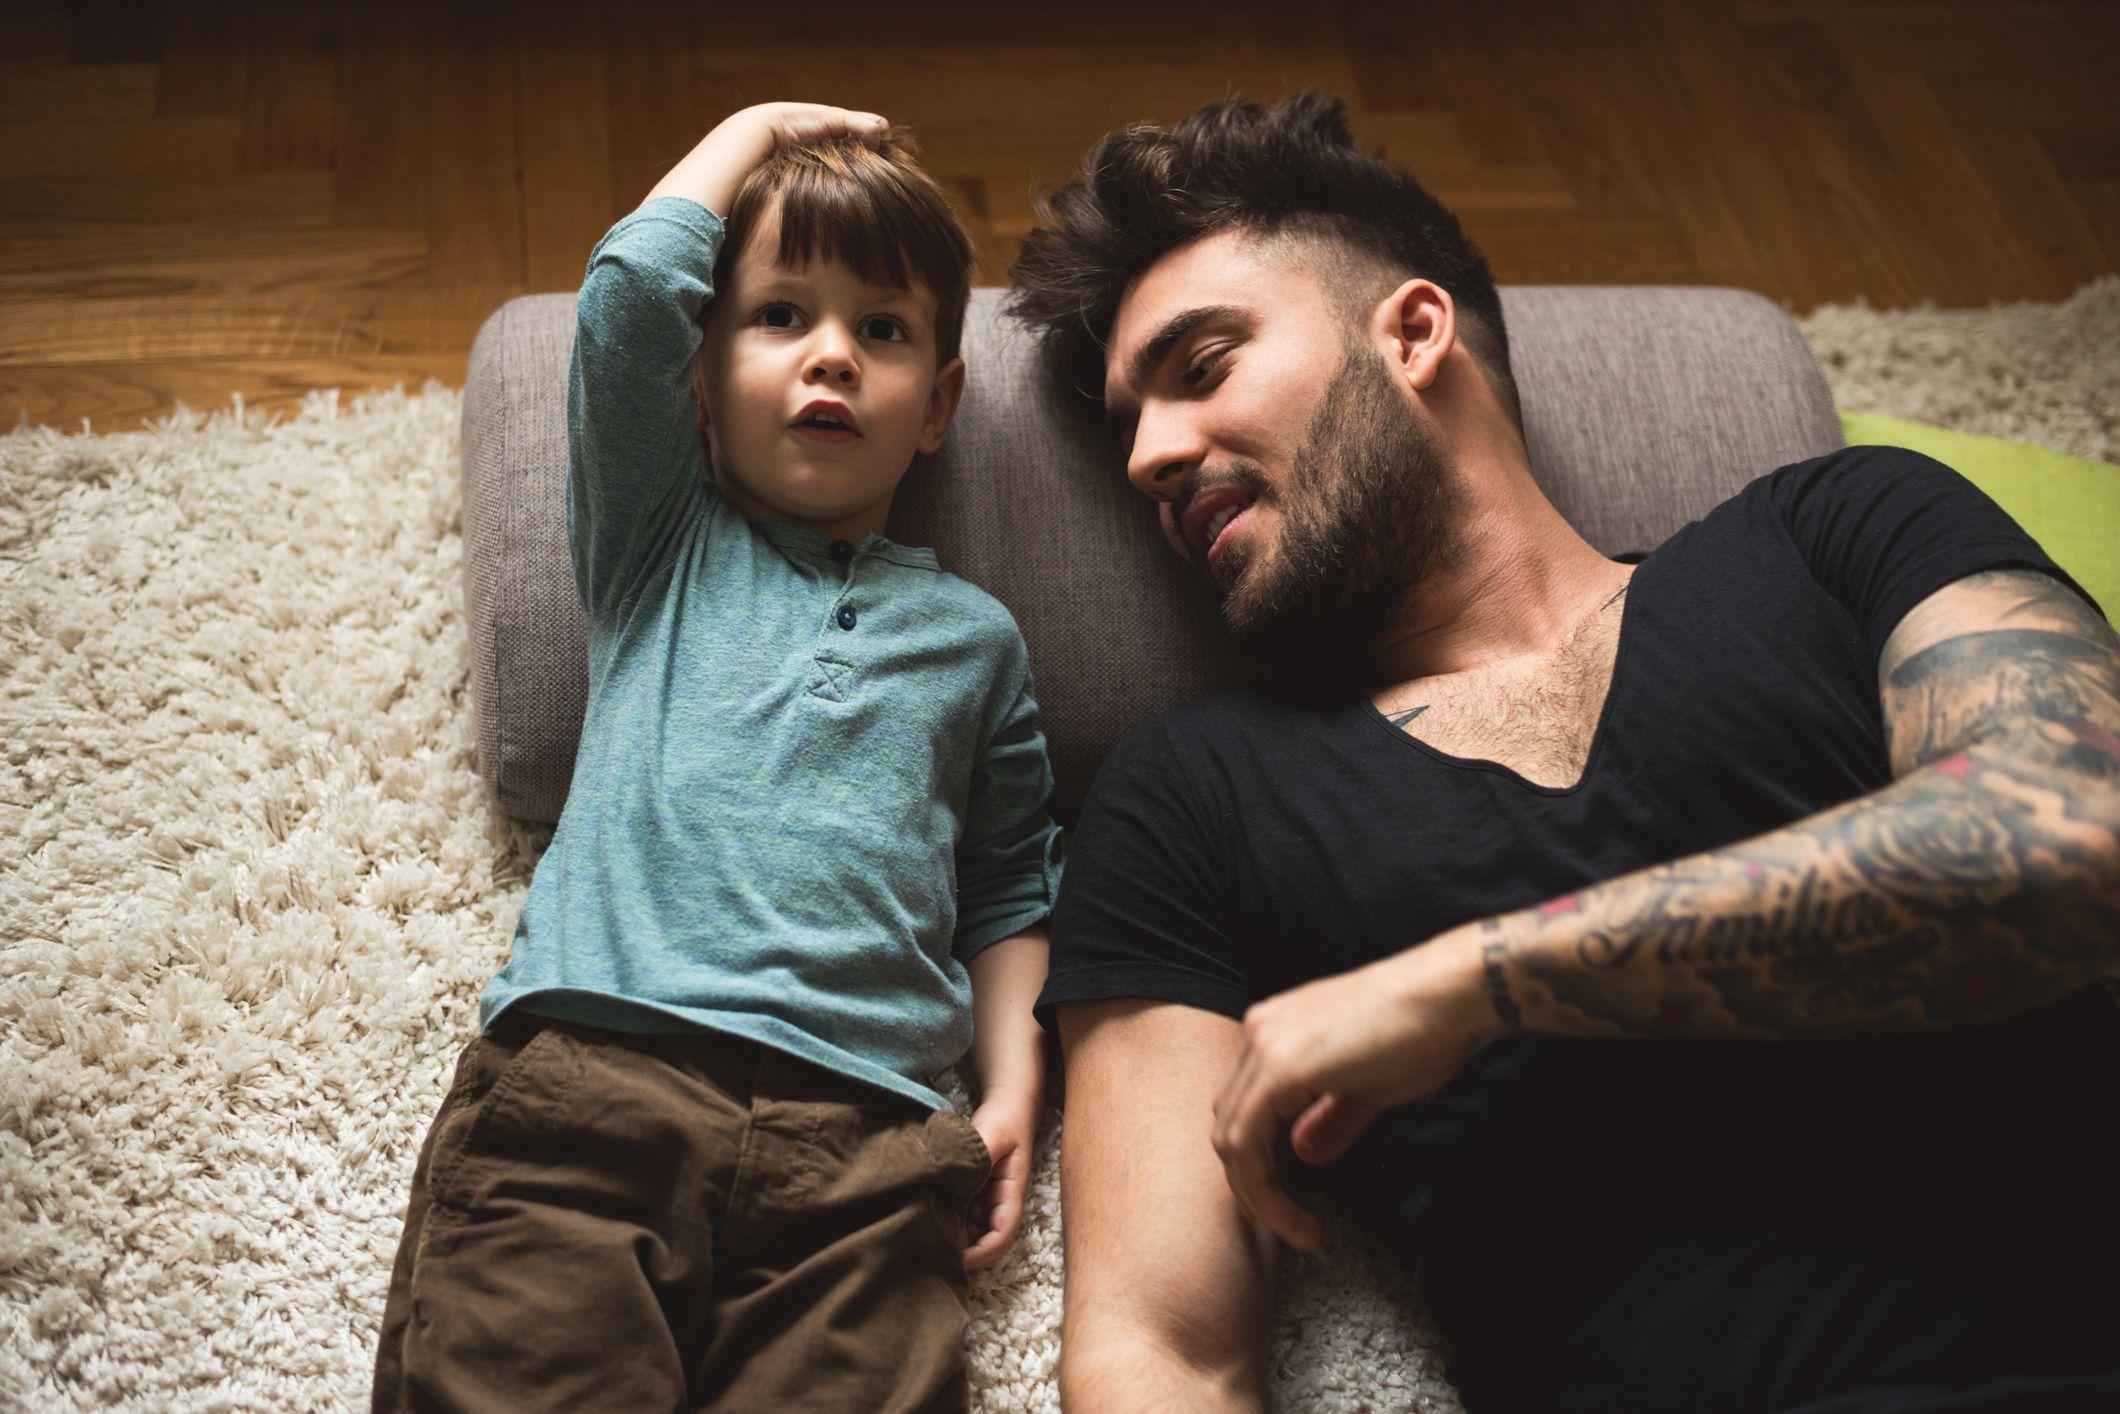 Build Healthy Self-Esteem: Give Children Relevant, Meaningful Feedback